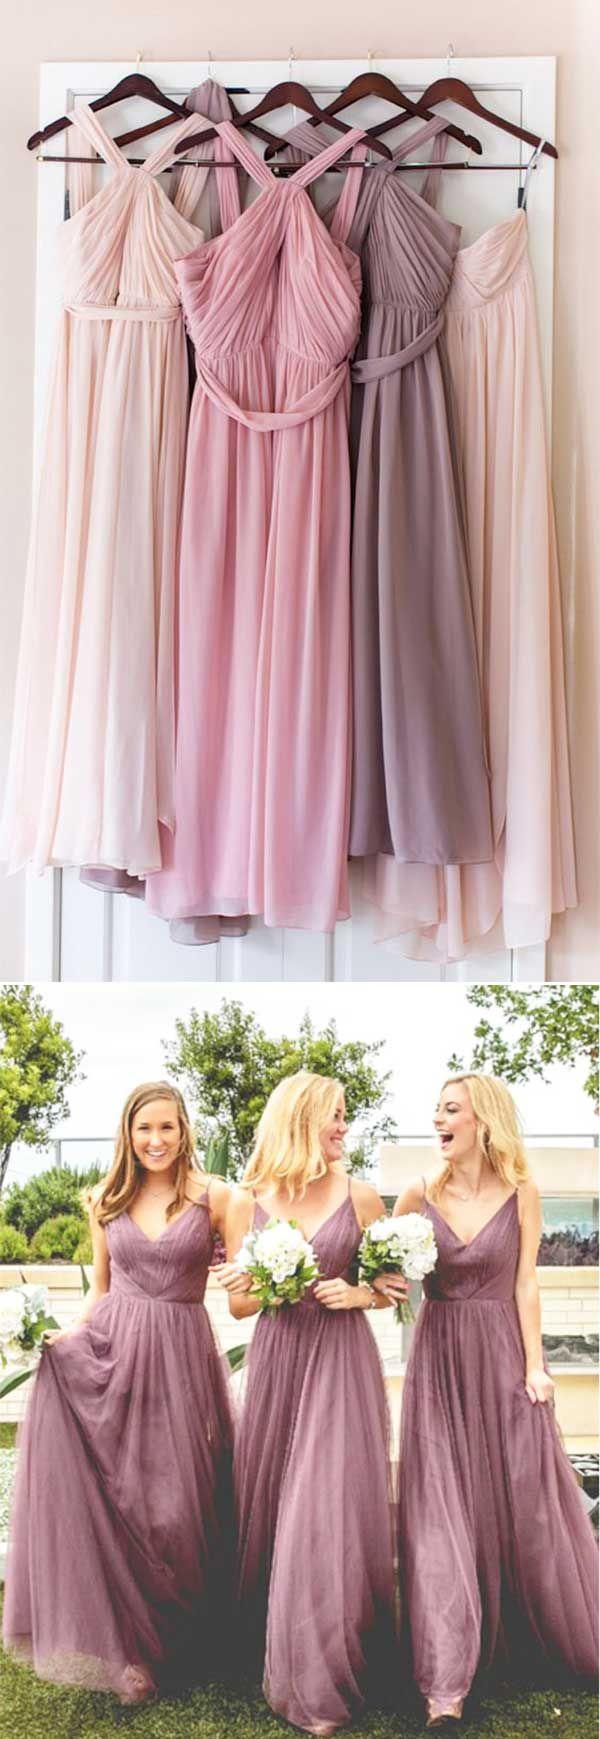 2018 STYLISH & PRETTIEST WEDDING COLOR TREND : SHADE OF MAUVE - Wedding Invites Paper  dusty pink wedding dresses/ shade of purple wedding gowns/ mauve bridesmaid dress